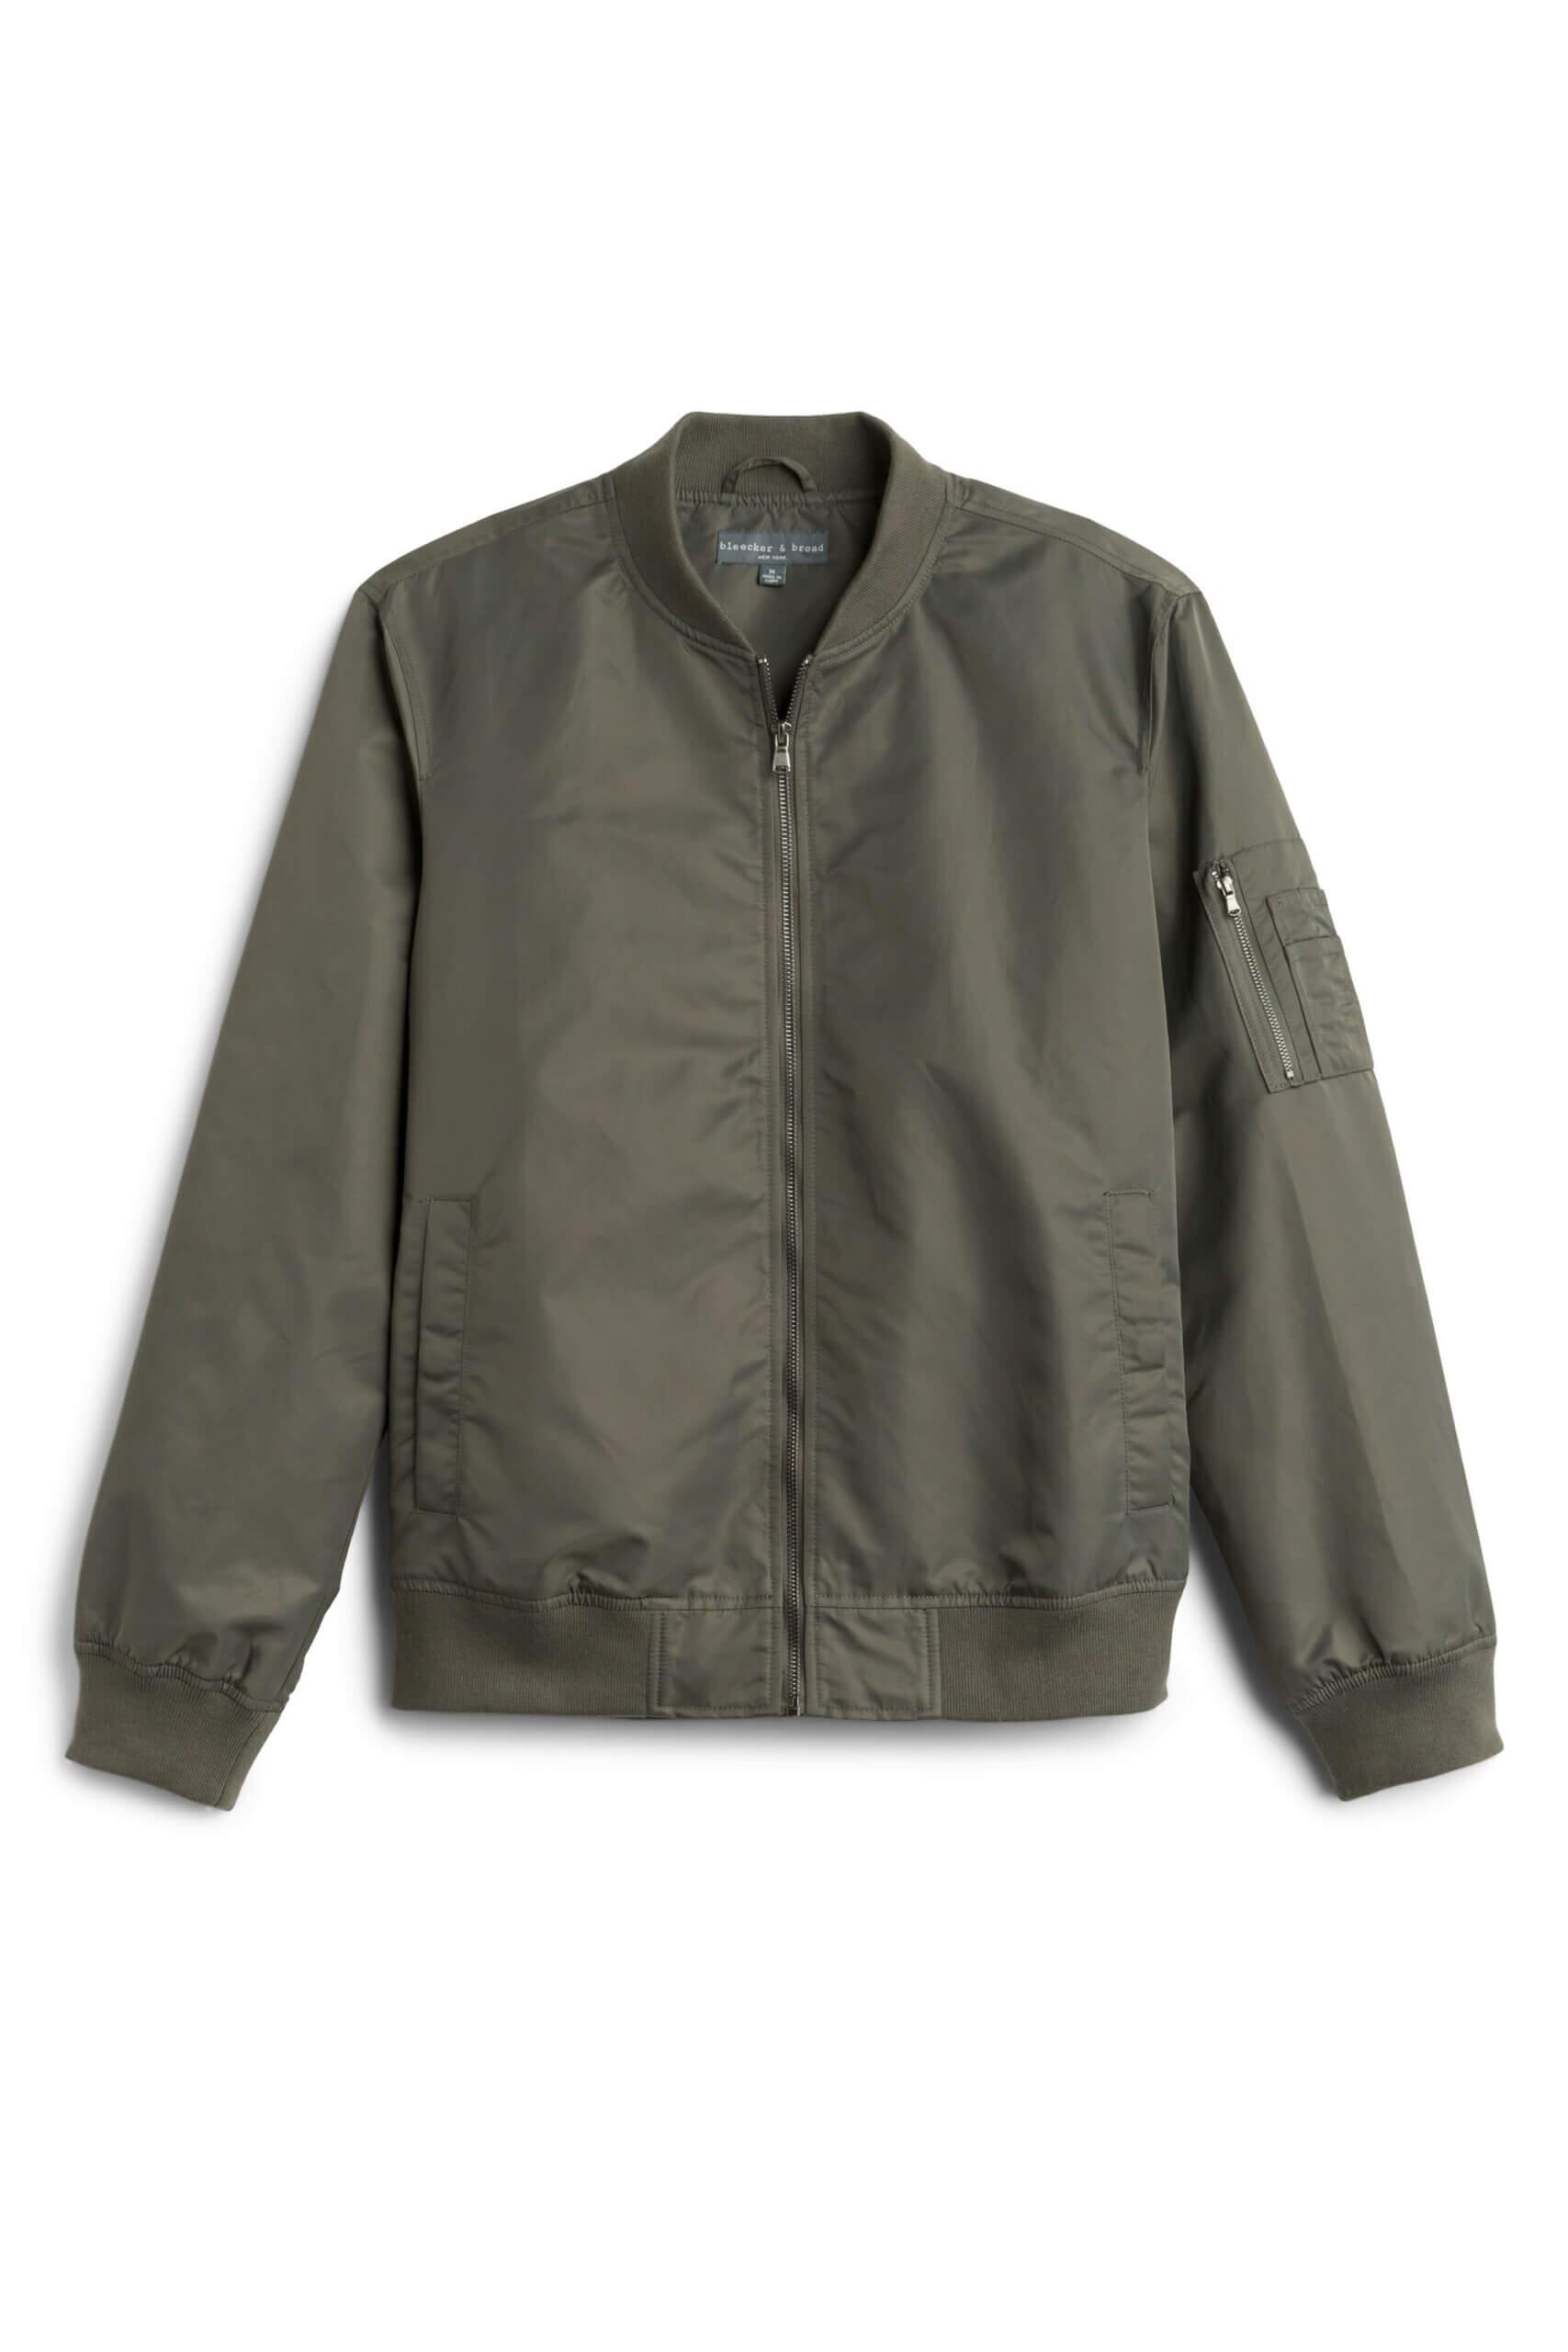 Stitch Fix Men's olive bomber jacket.